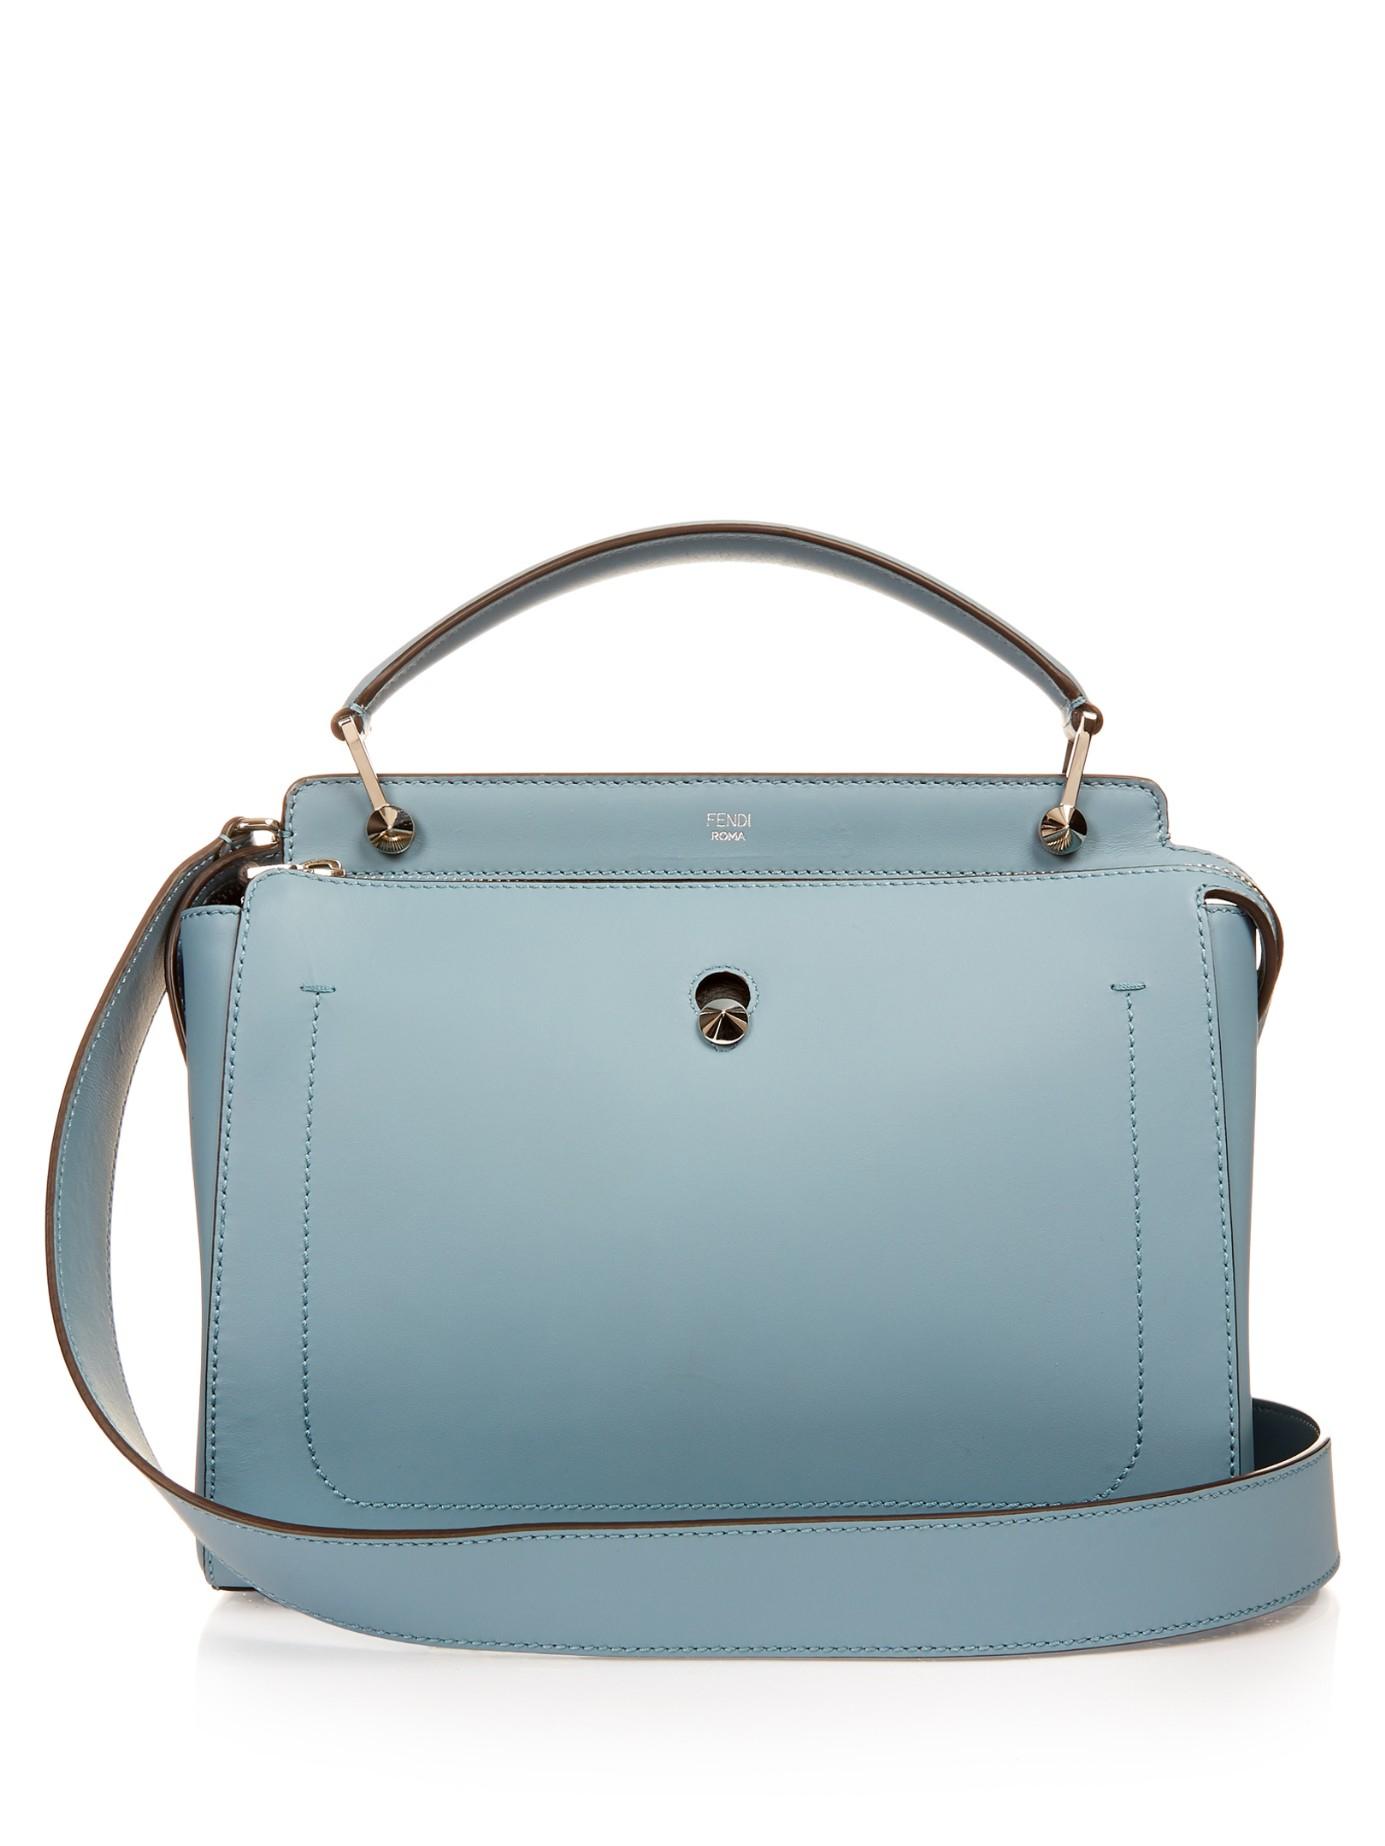 1949e2b0f2 Fendi Dotcom Leather Bag in Blue - Lyst